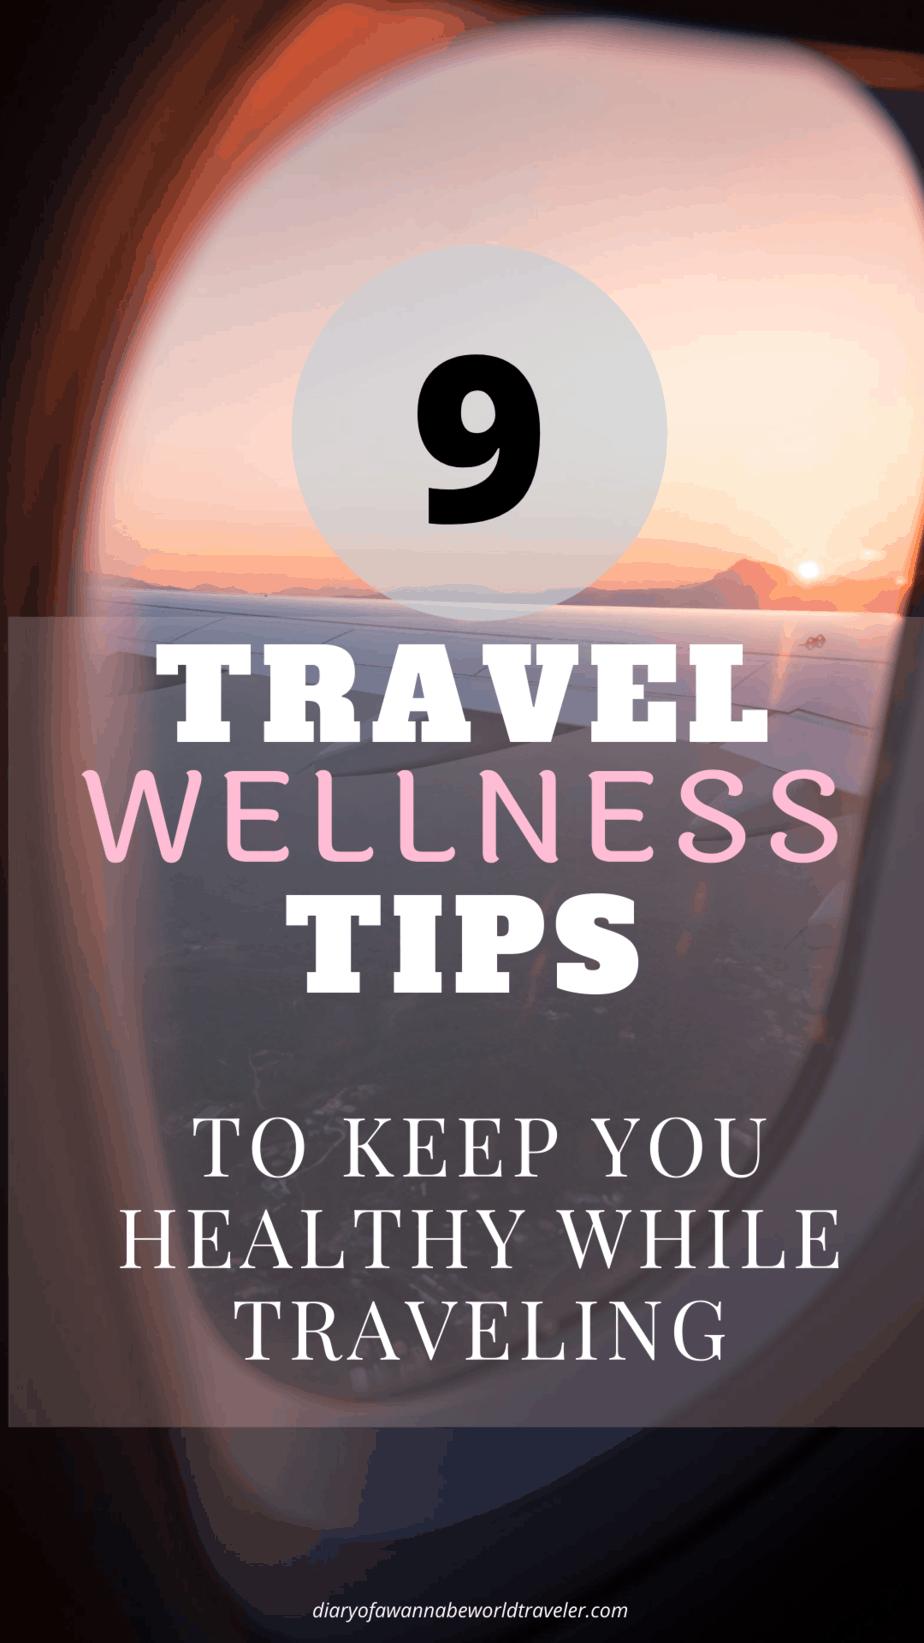 Travel wellness tips pin